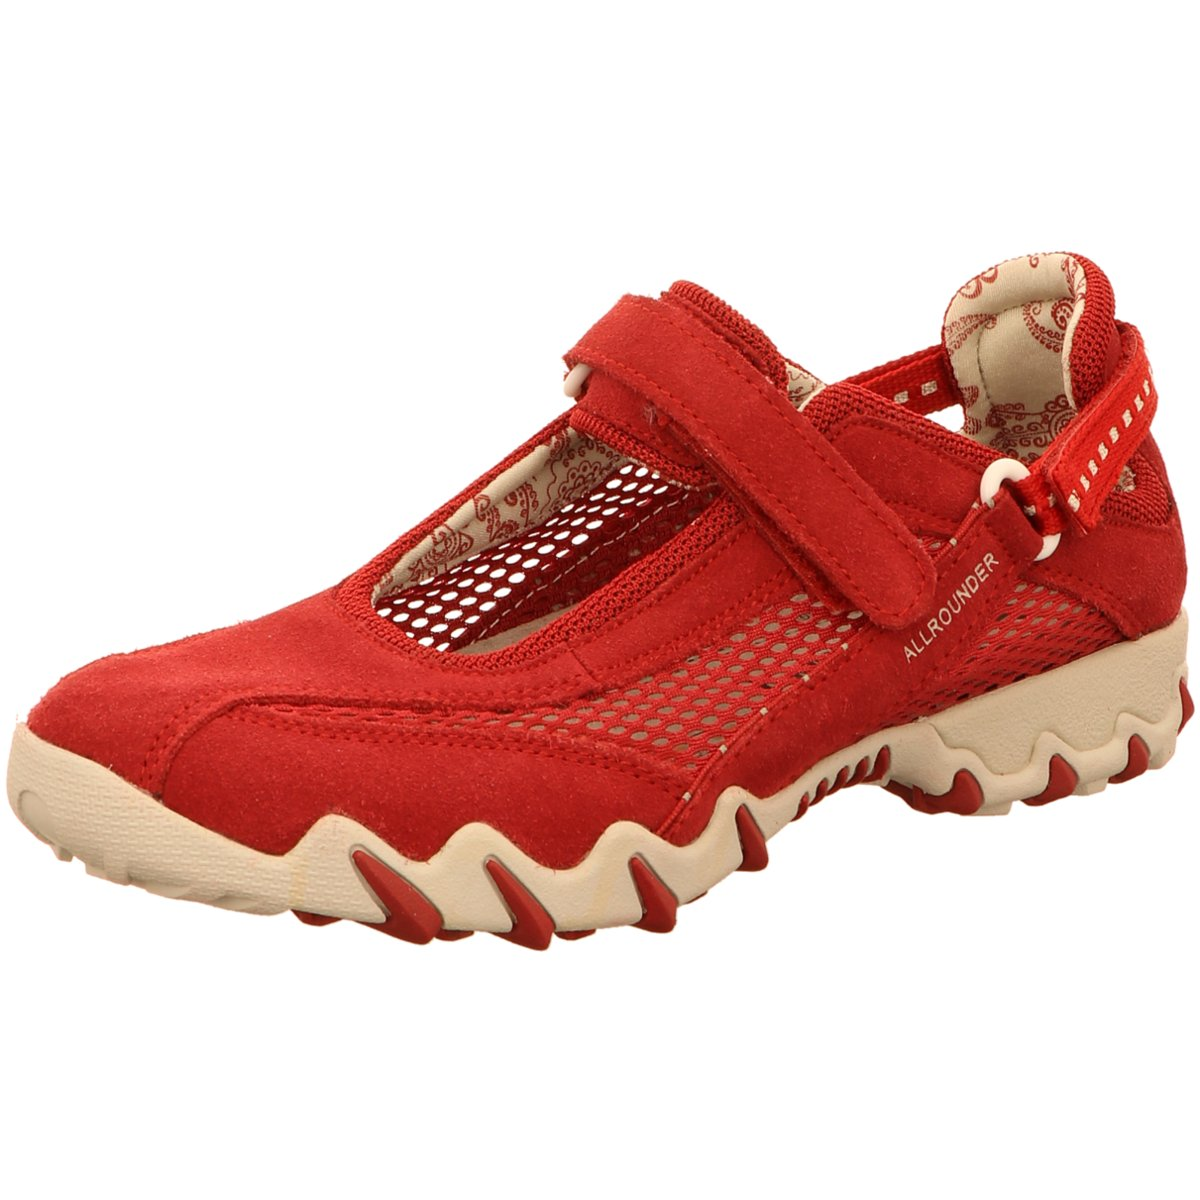 Details zu Mephisto Damen Slipper Niro Red (rot) Slipper Damenschuhe Modische Pumps